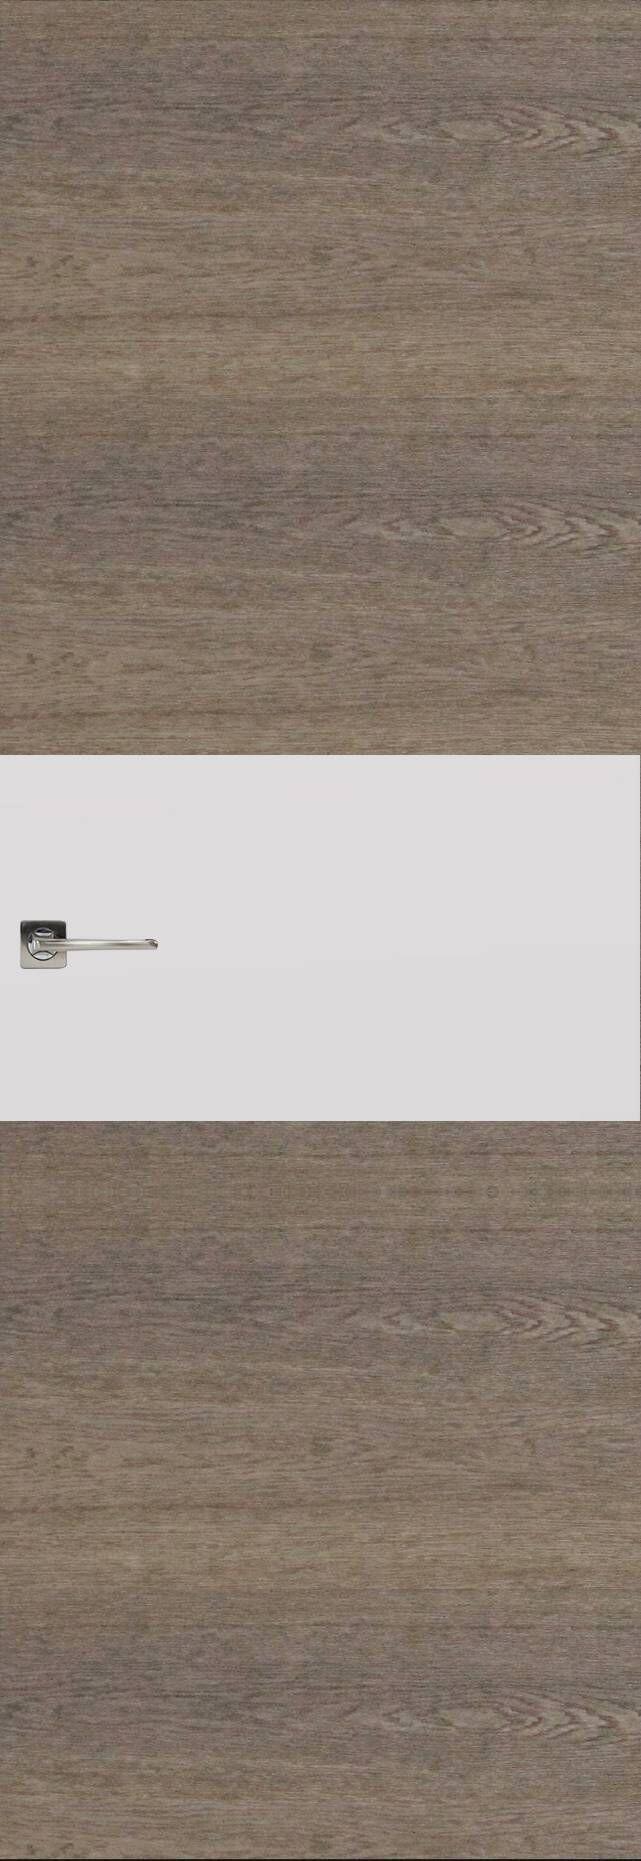 Tivoli Е-4 Invisible цвет - Дуб антик Без стекла (ДГ)